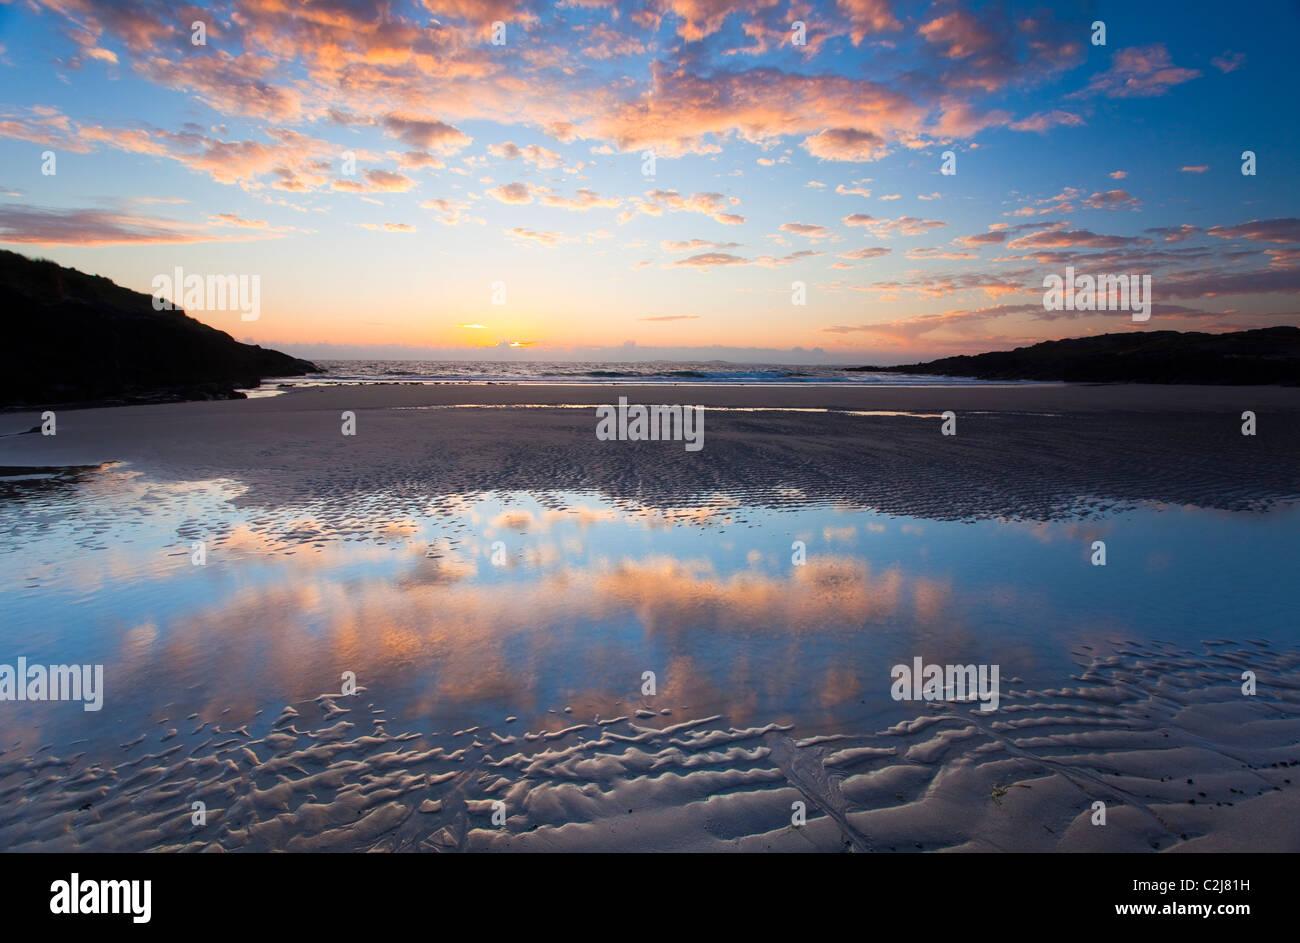 Am Abend Strand Reflexionen, False Bay, Connemara, Co. Galway, Irland. Stockbild